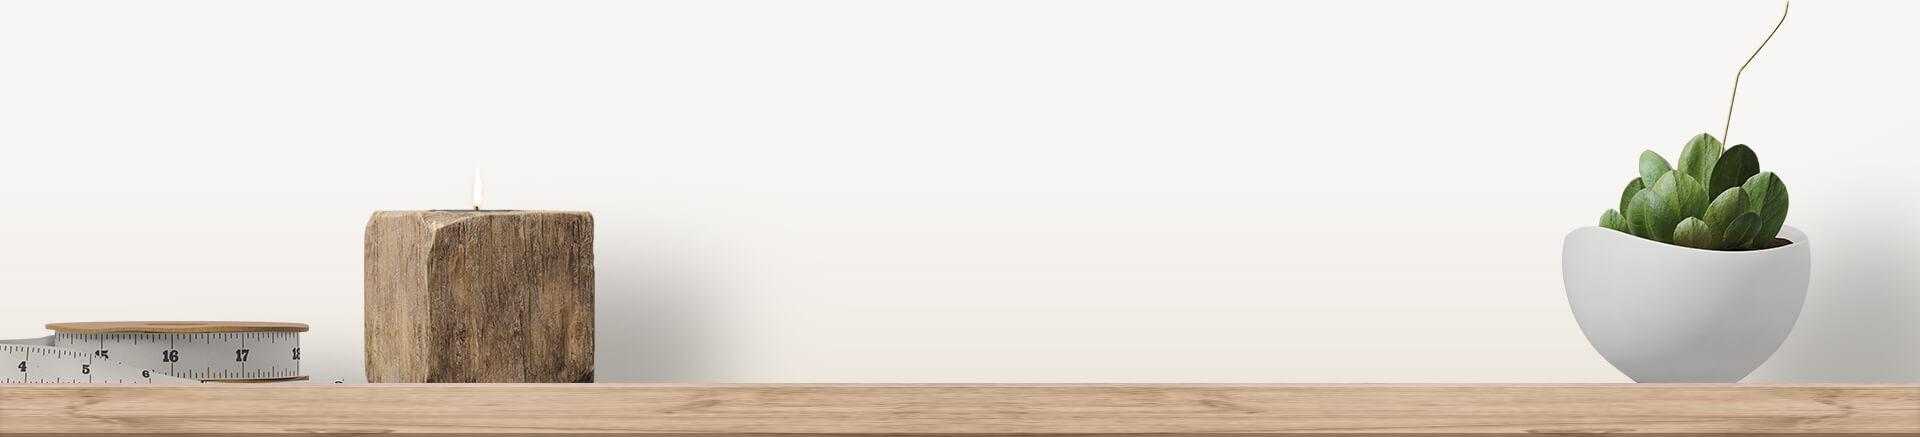 hardwood floor refinishing pleasanton ca of european hardwood floors your flooring specialist with carpenter2 home shelf